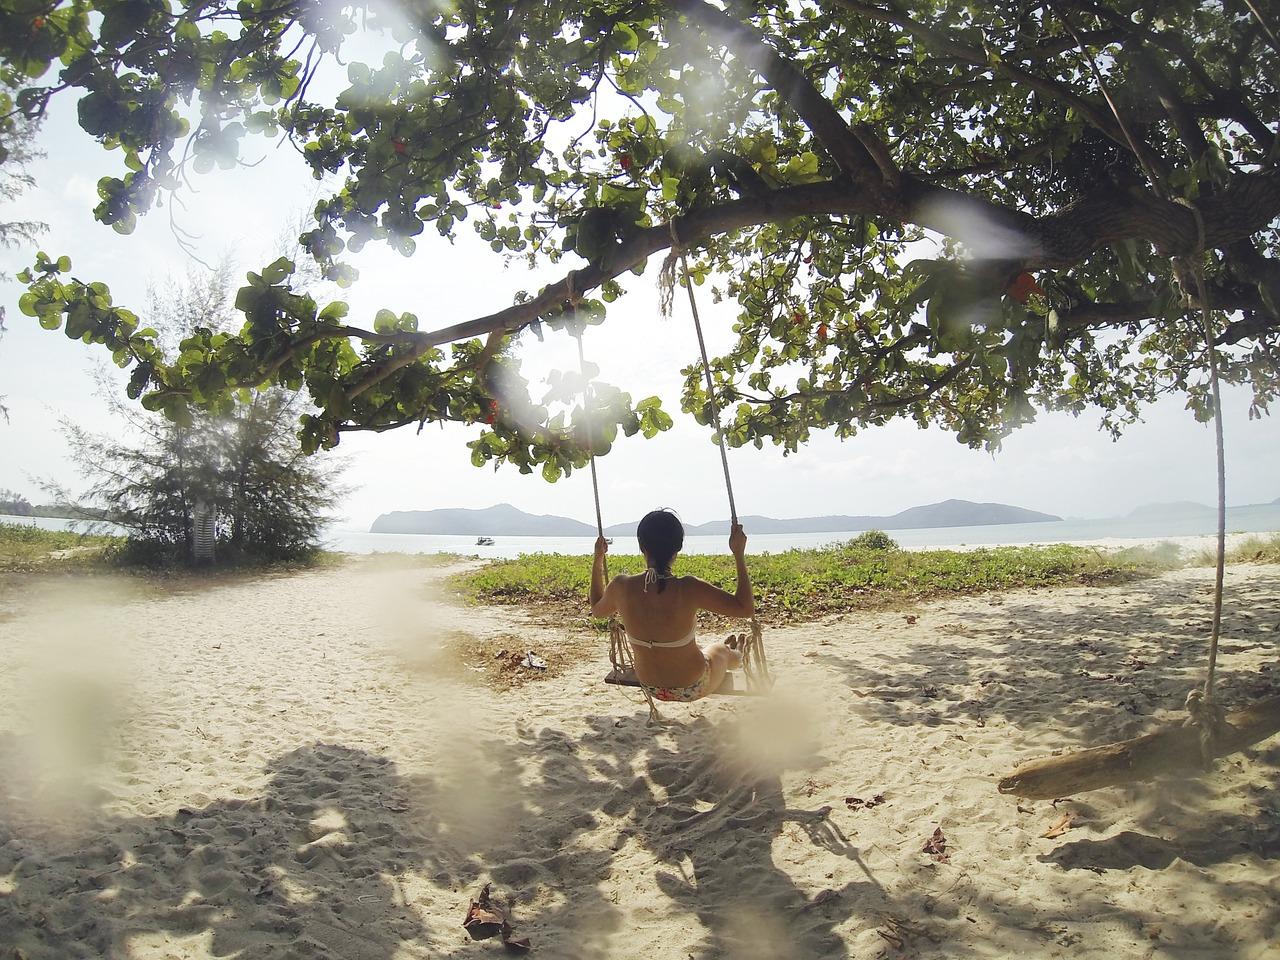 beach swing woman summertime